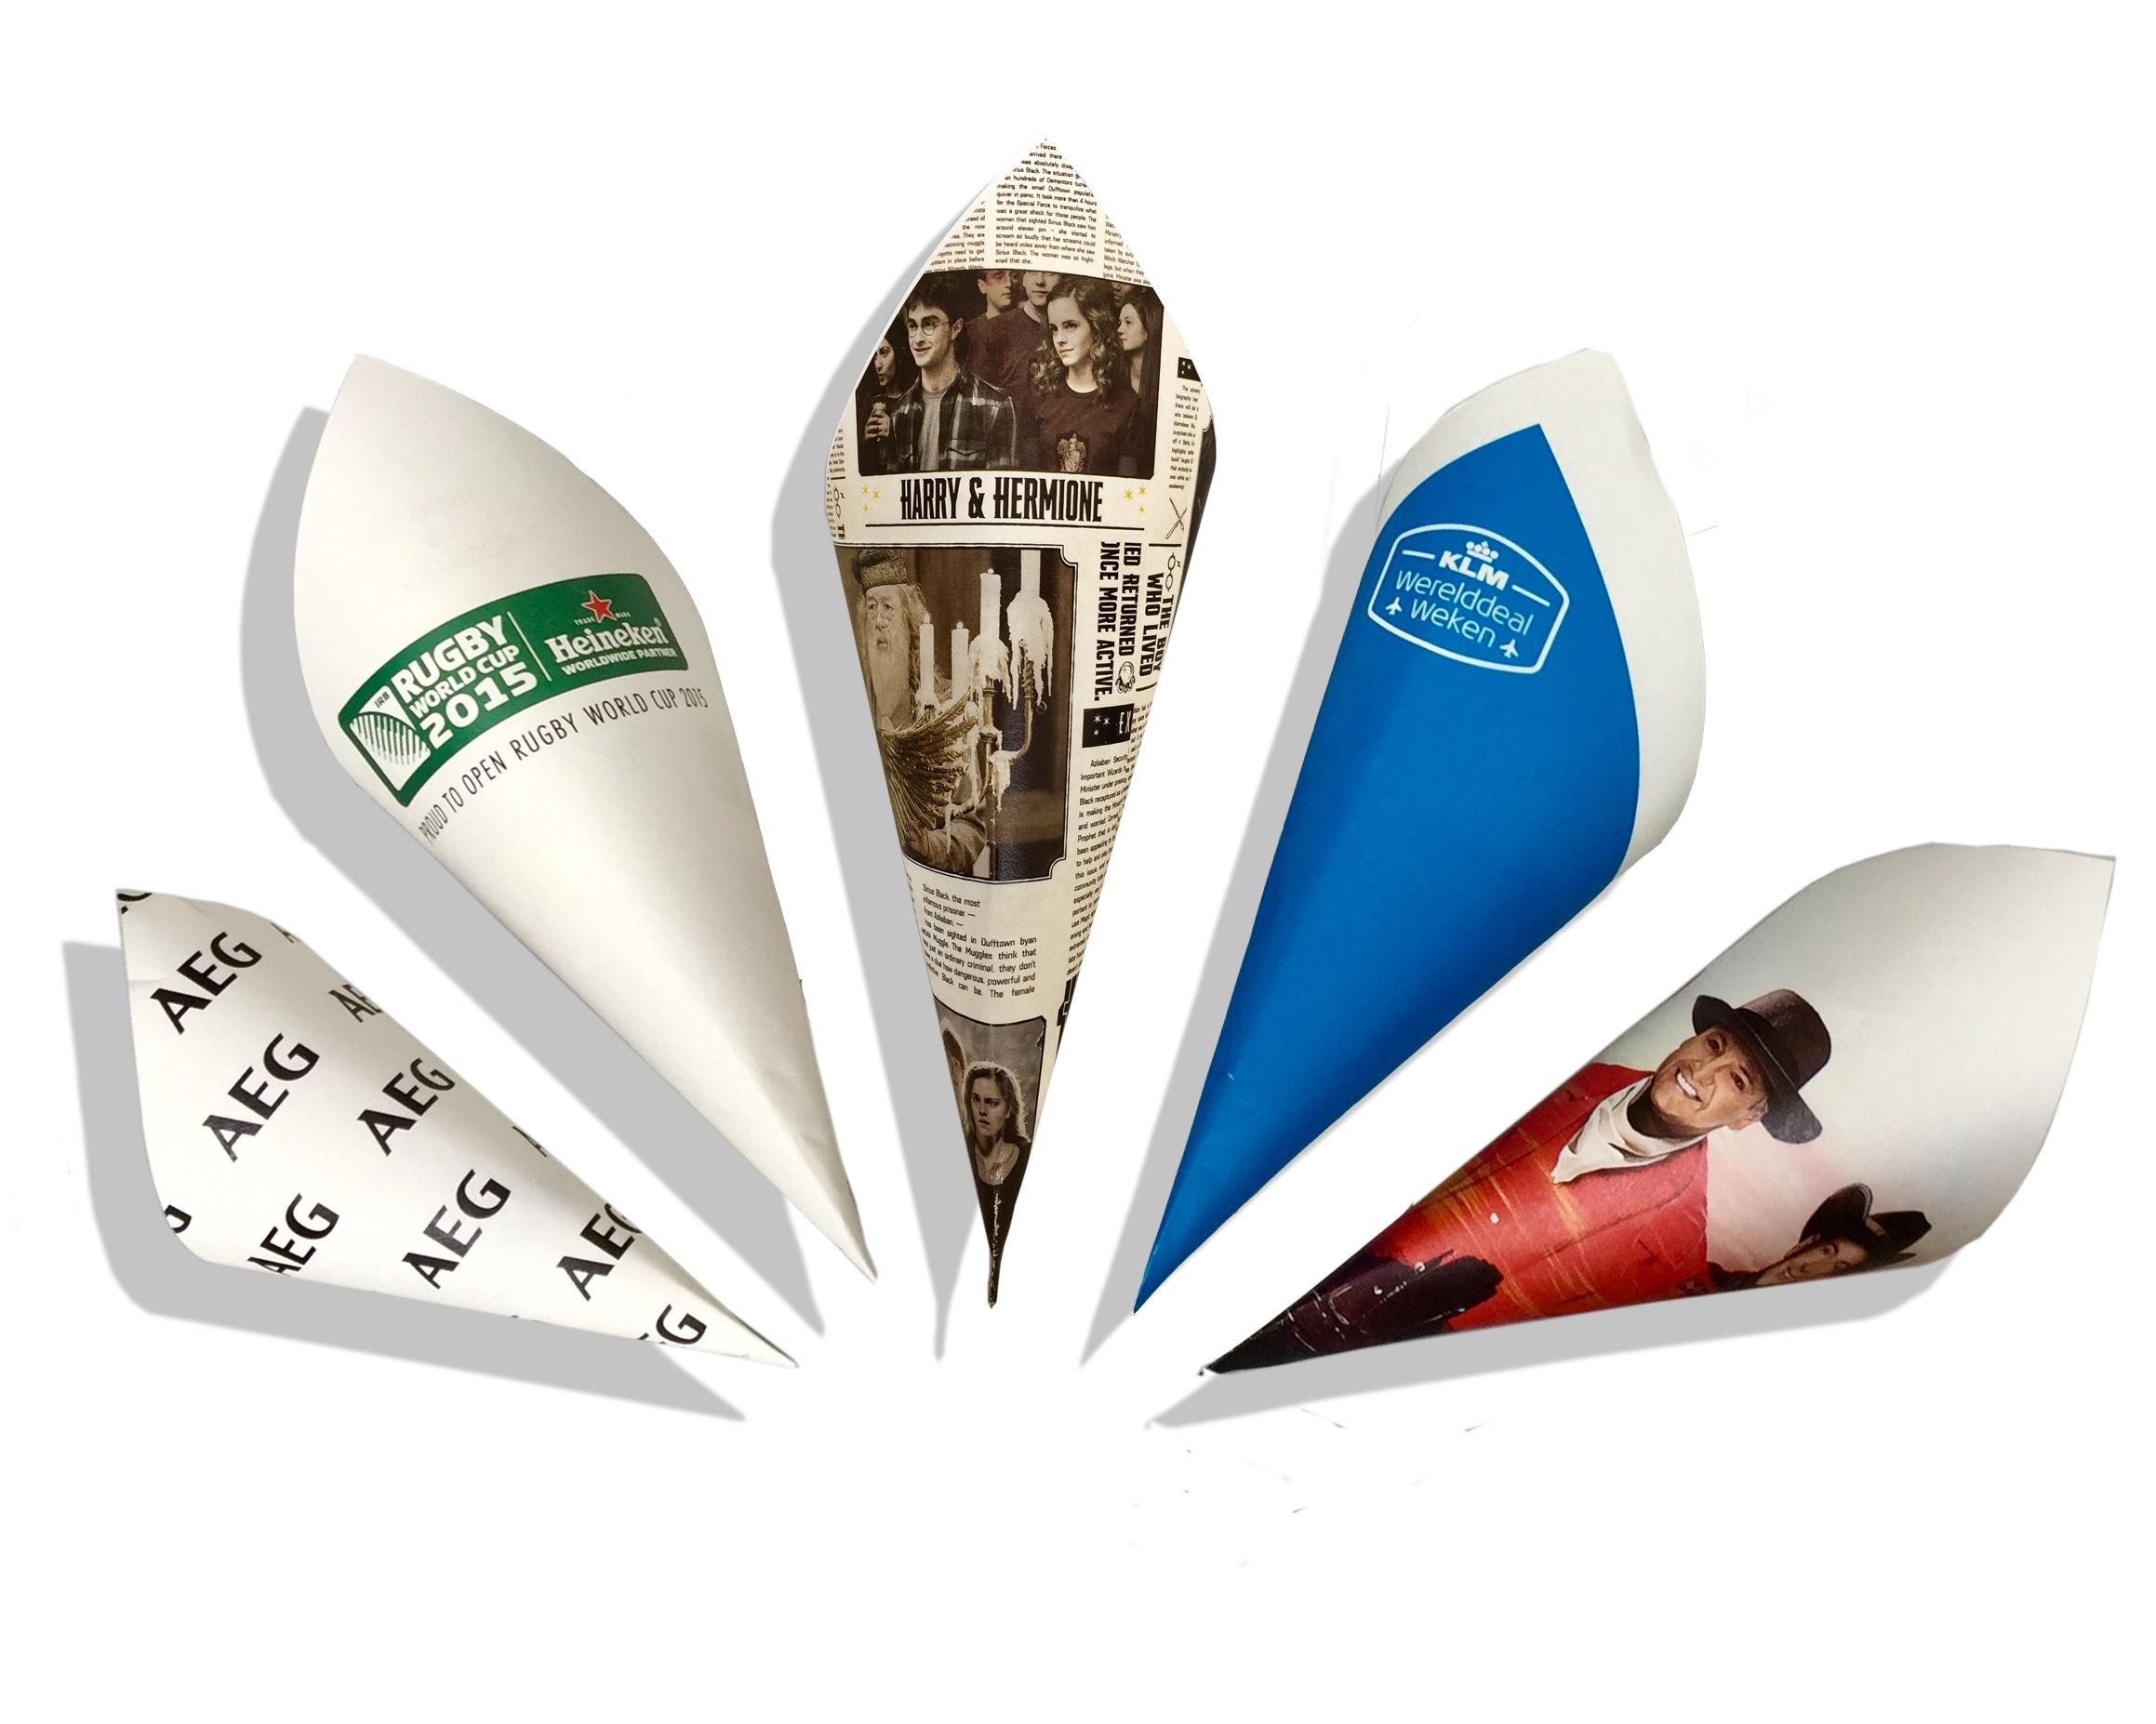 Personalized french fry cones witt your own logo for Bedrukte zakjes